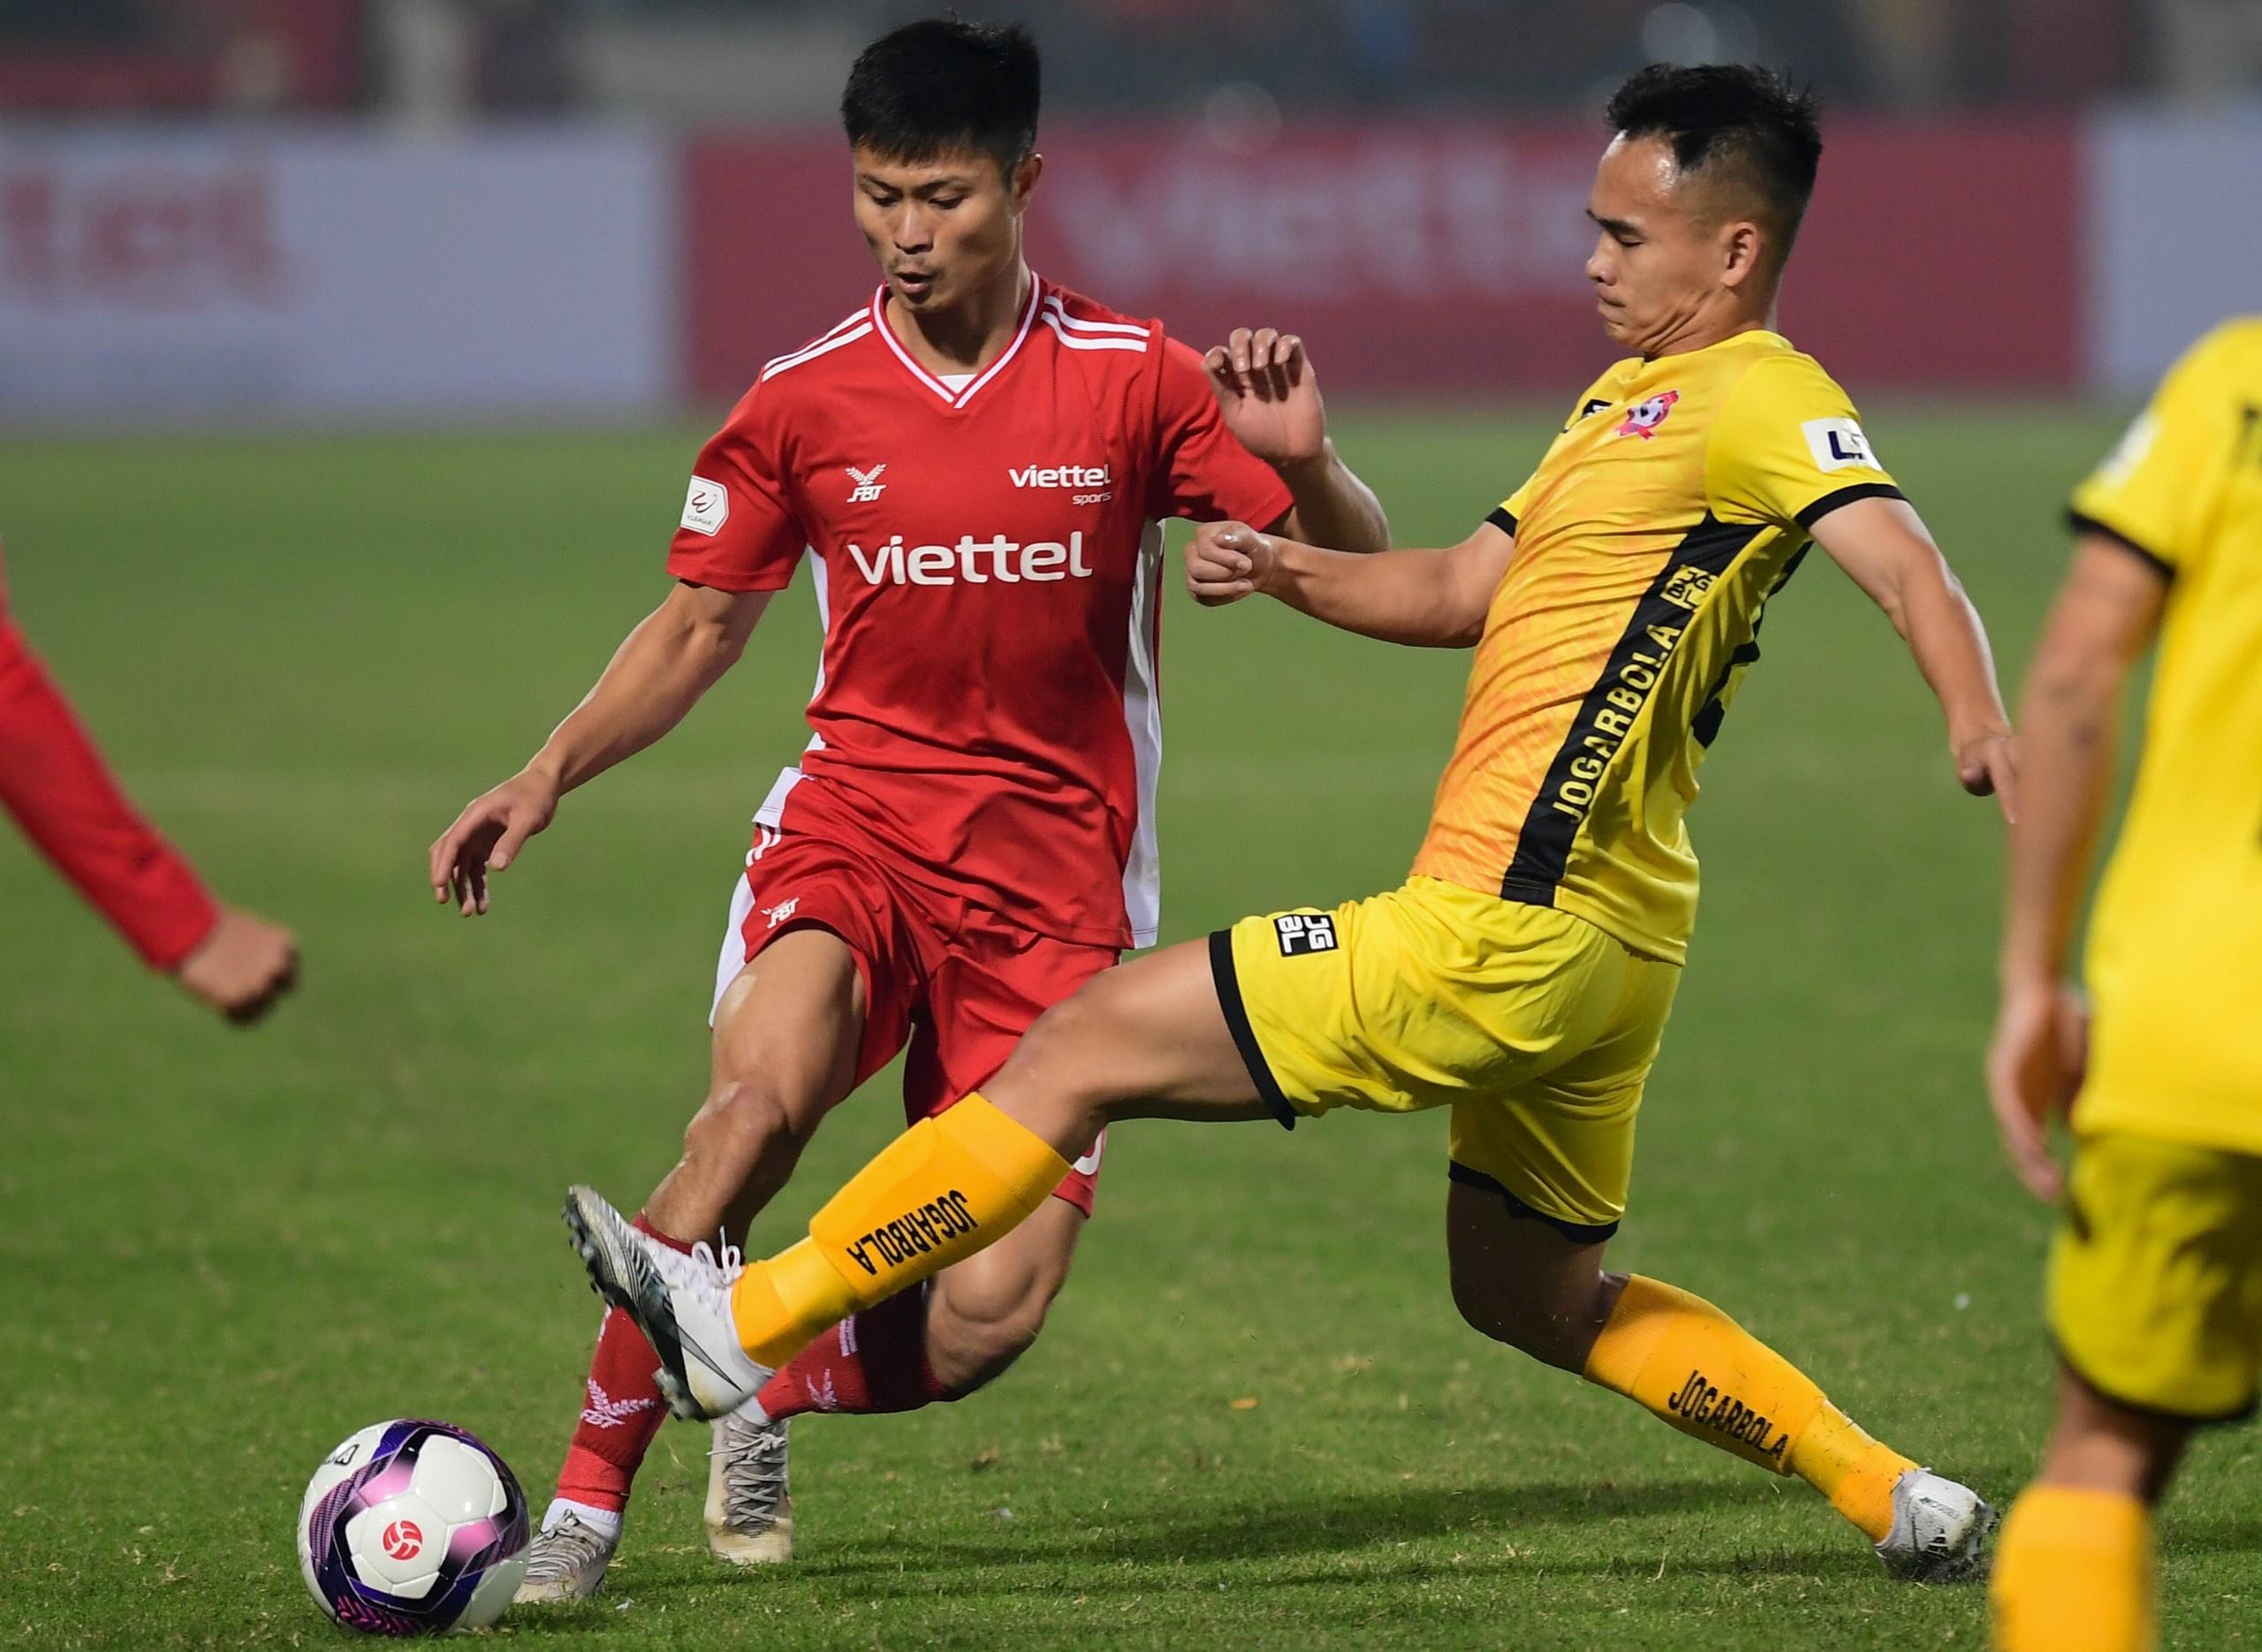 CLB Viettel vs Hai Phong anh 6